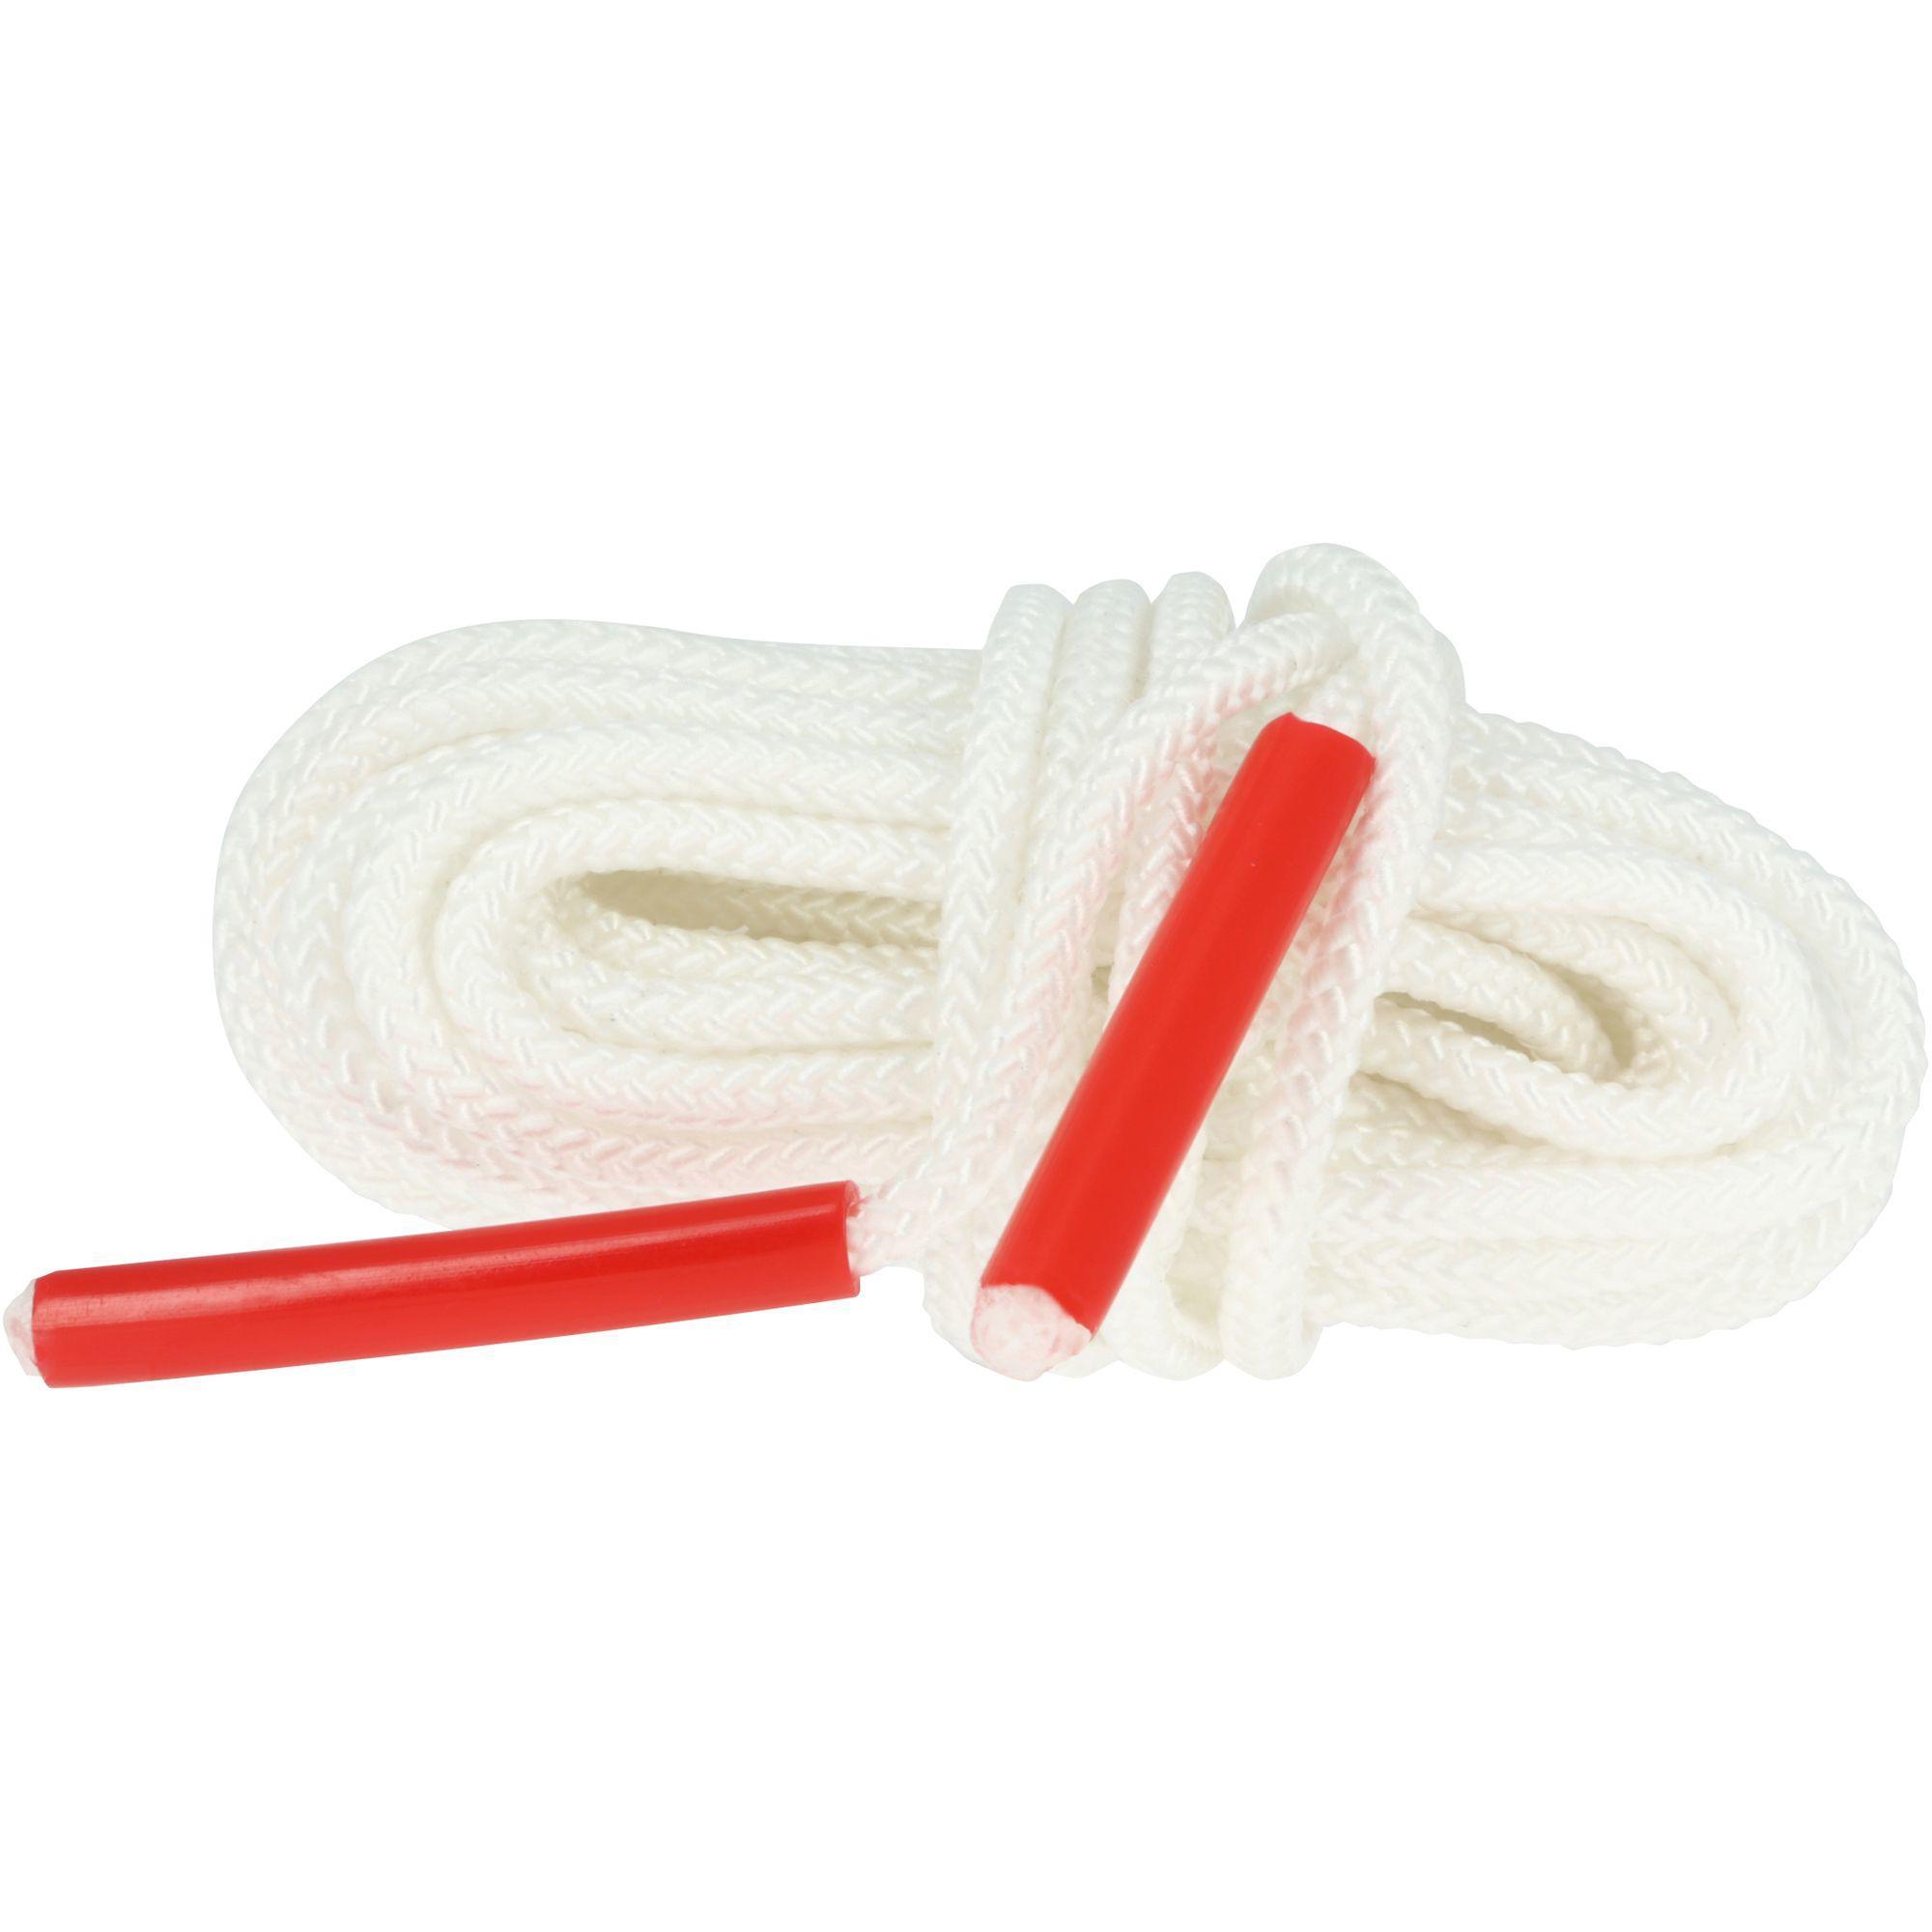 Essential 240 Trampoline Rope